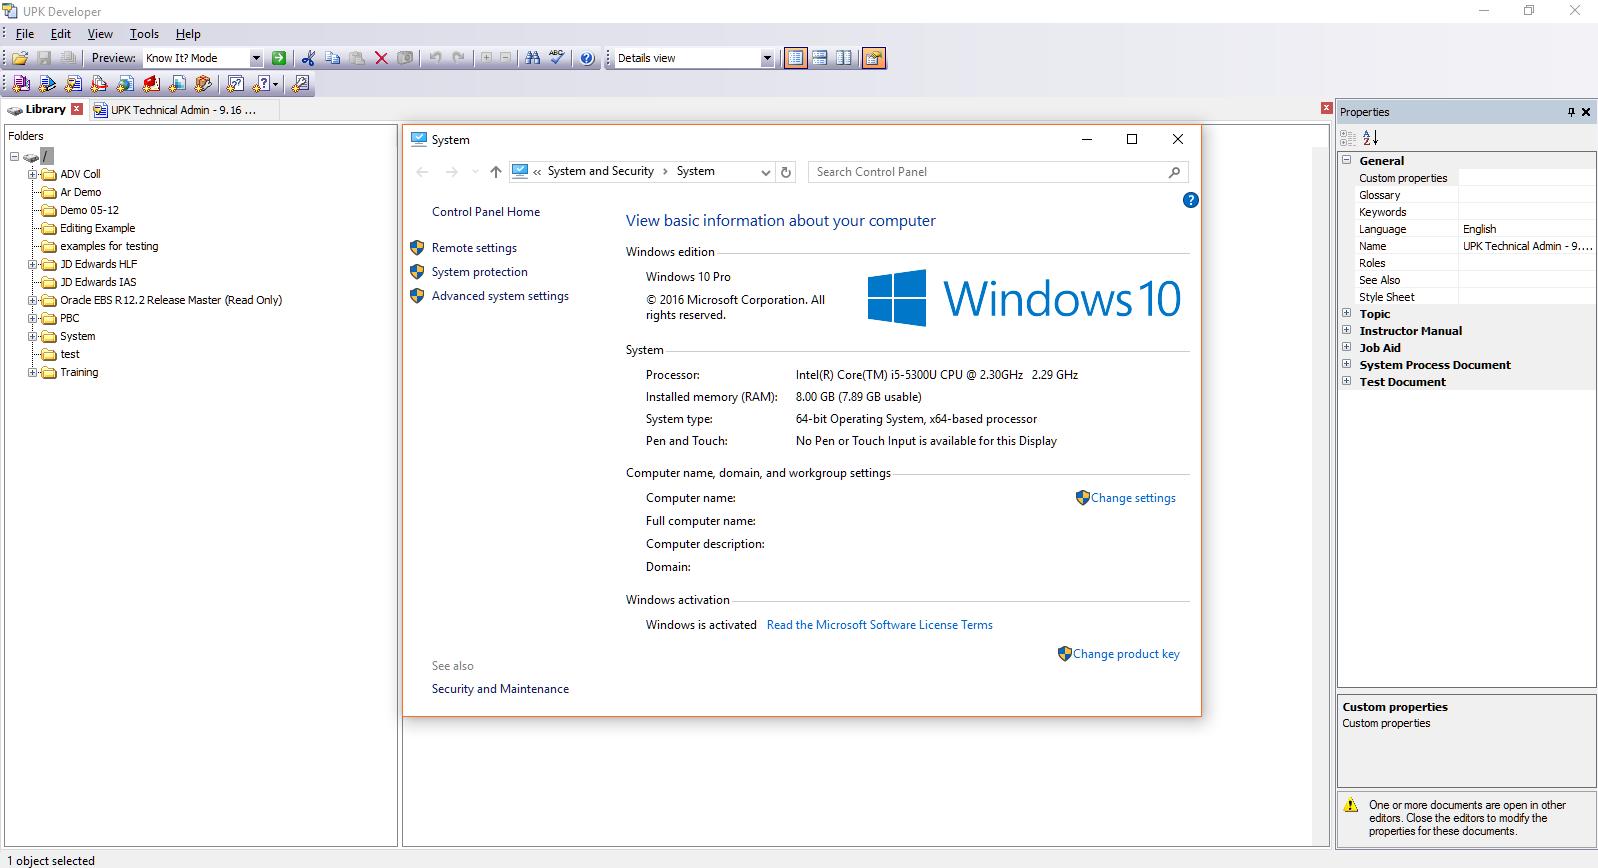 Windows10.png